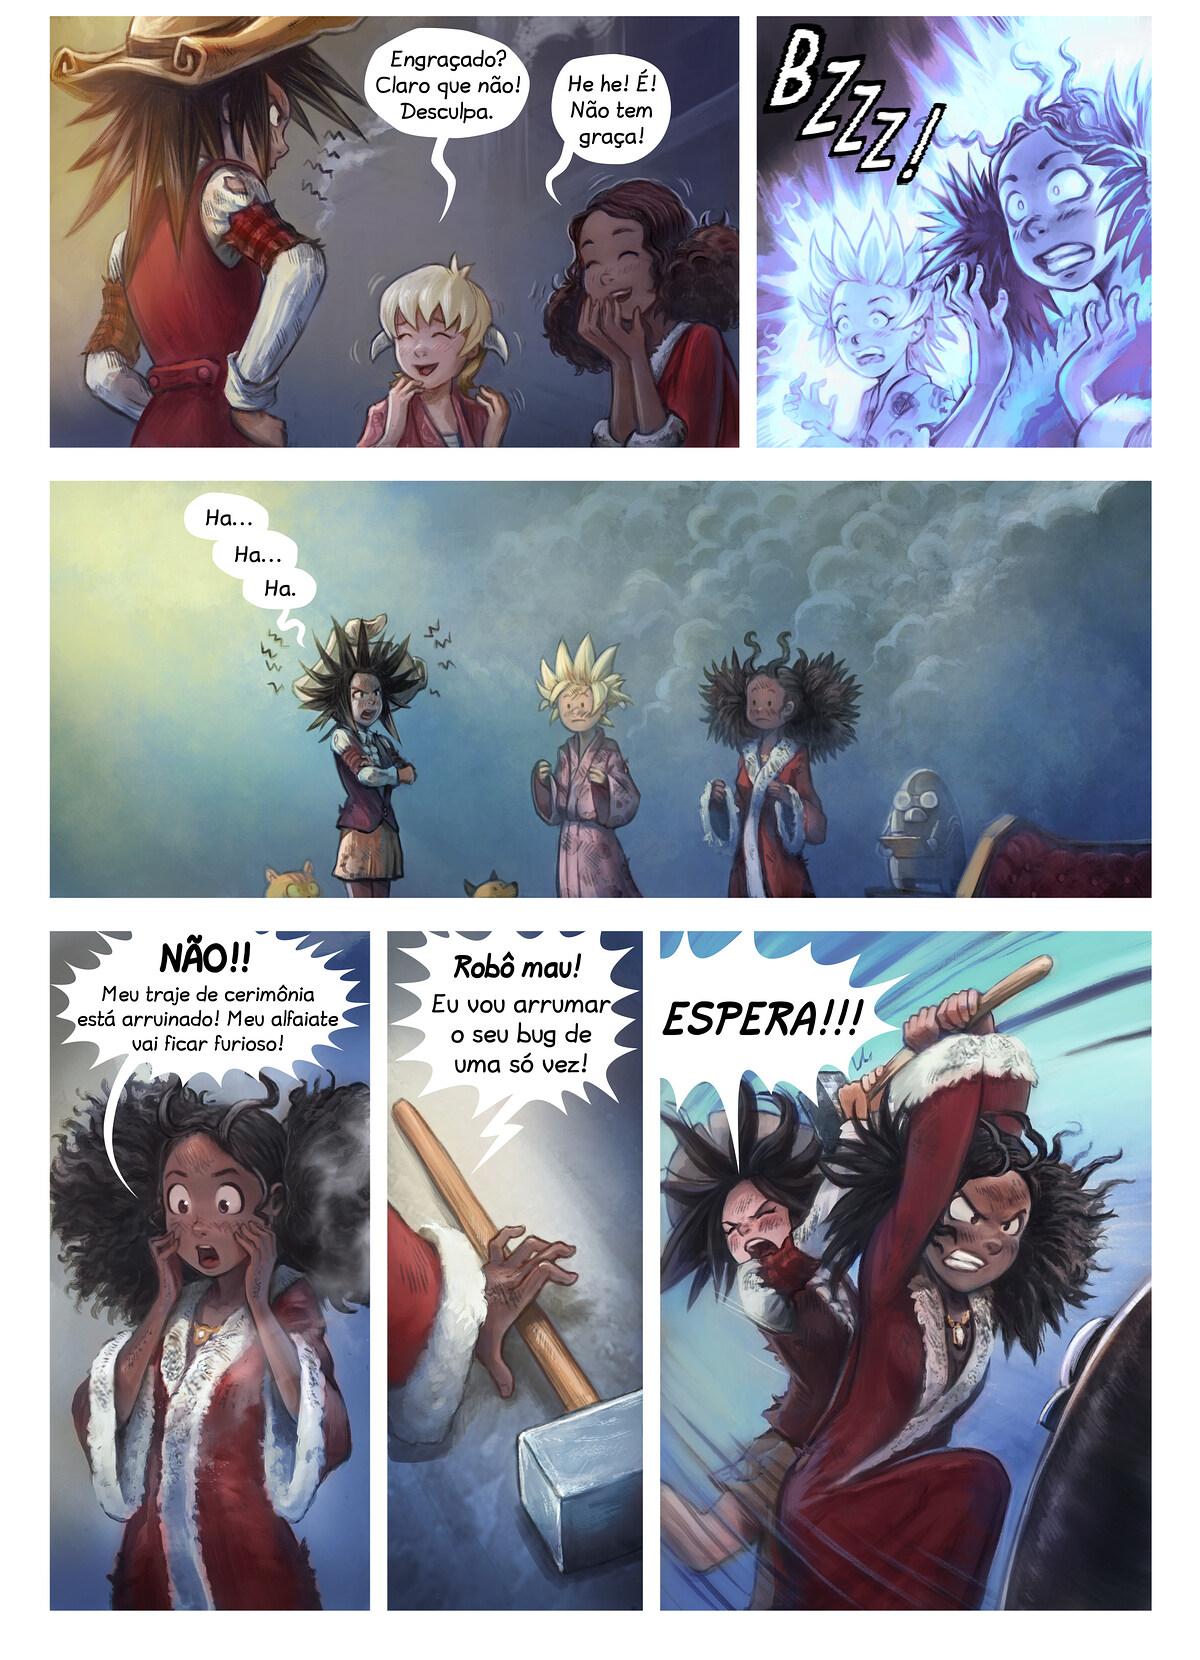 A webcomic page of Pepper&Carrot, episódio 27 [pt], página 5